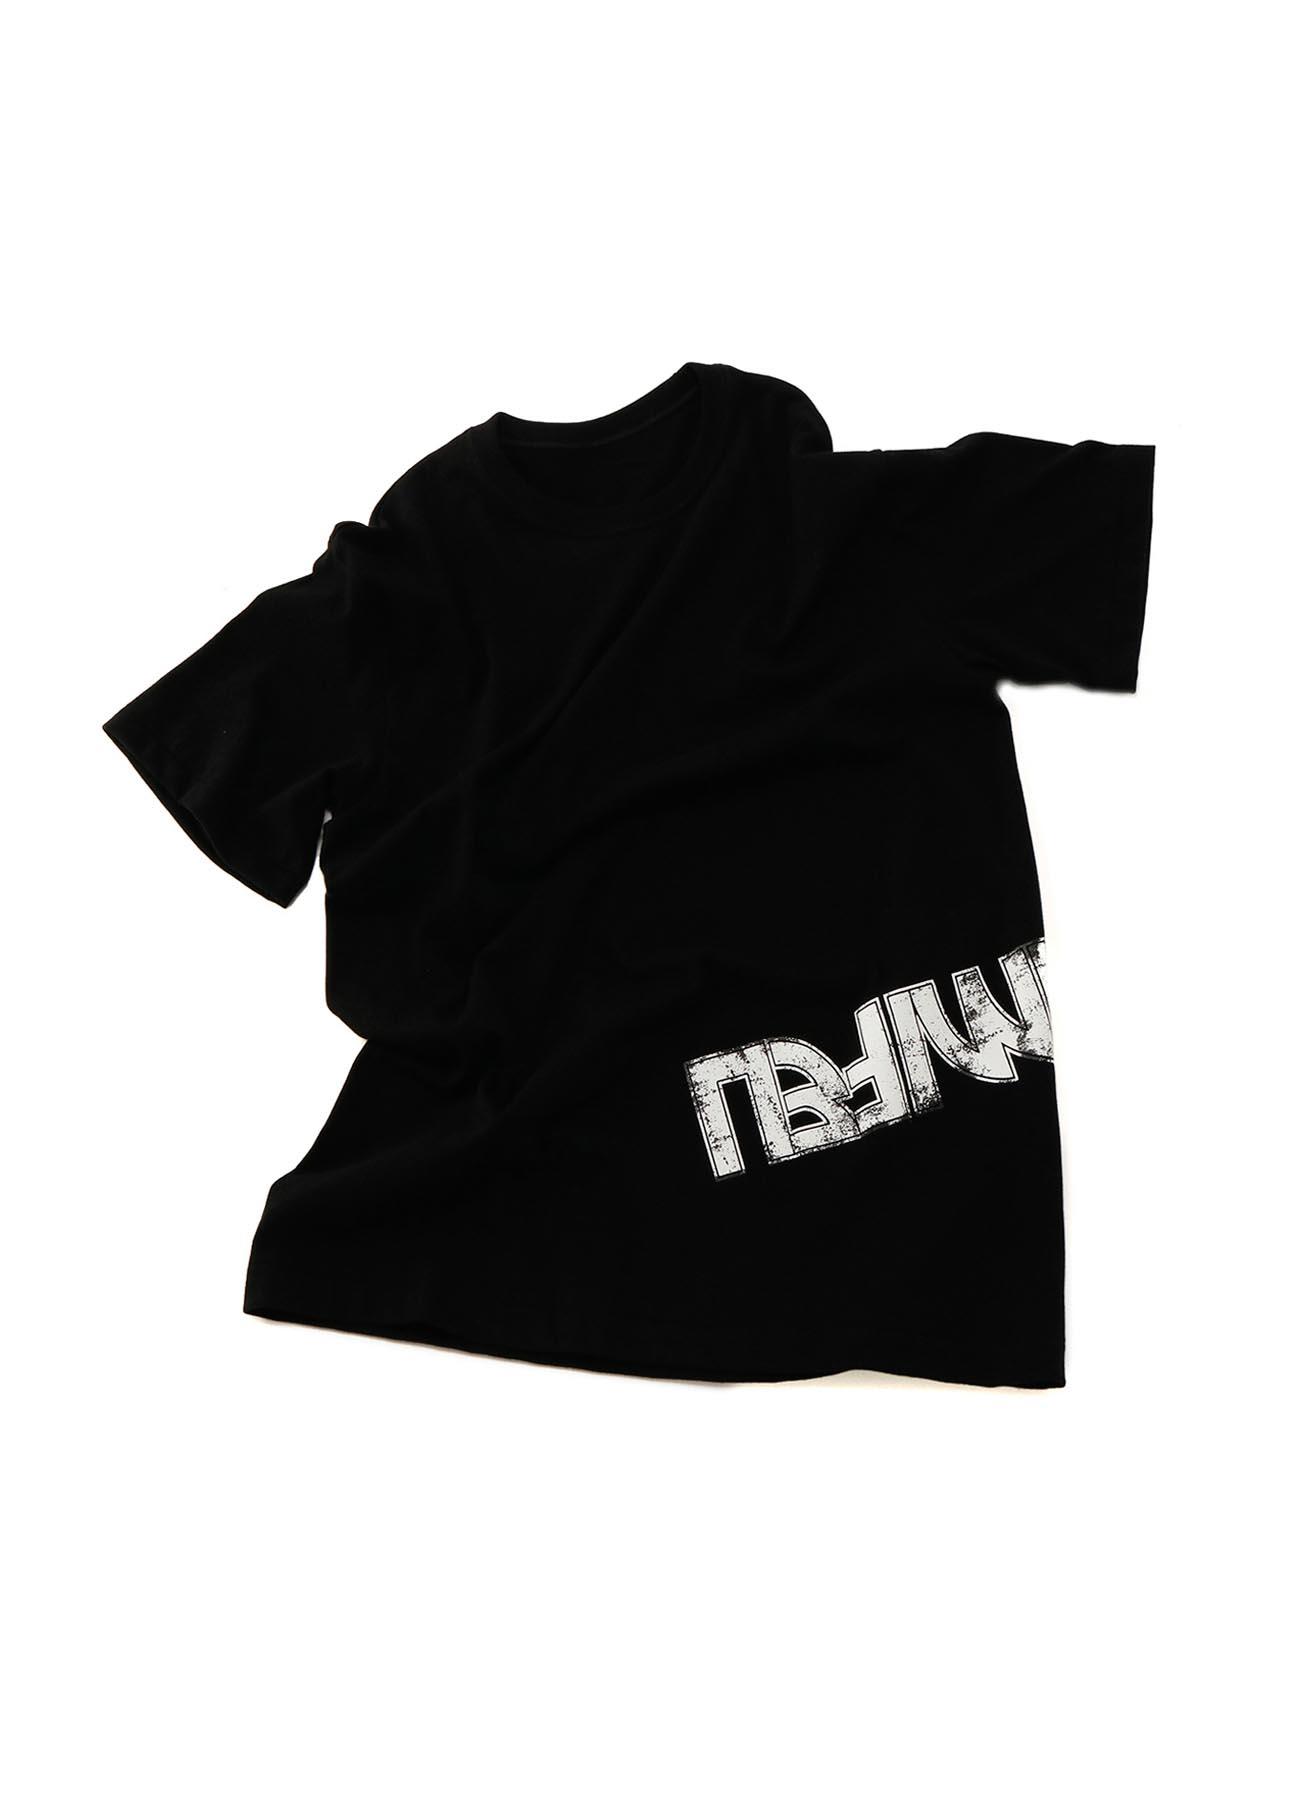 [THE SHOP Limited Product] 20/-Plain Stitch LIMI FEU Print T-Shirt B